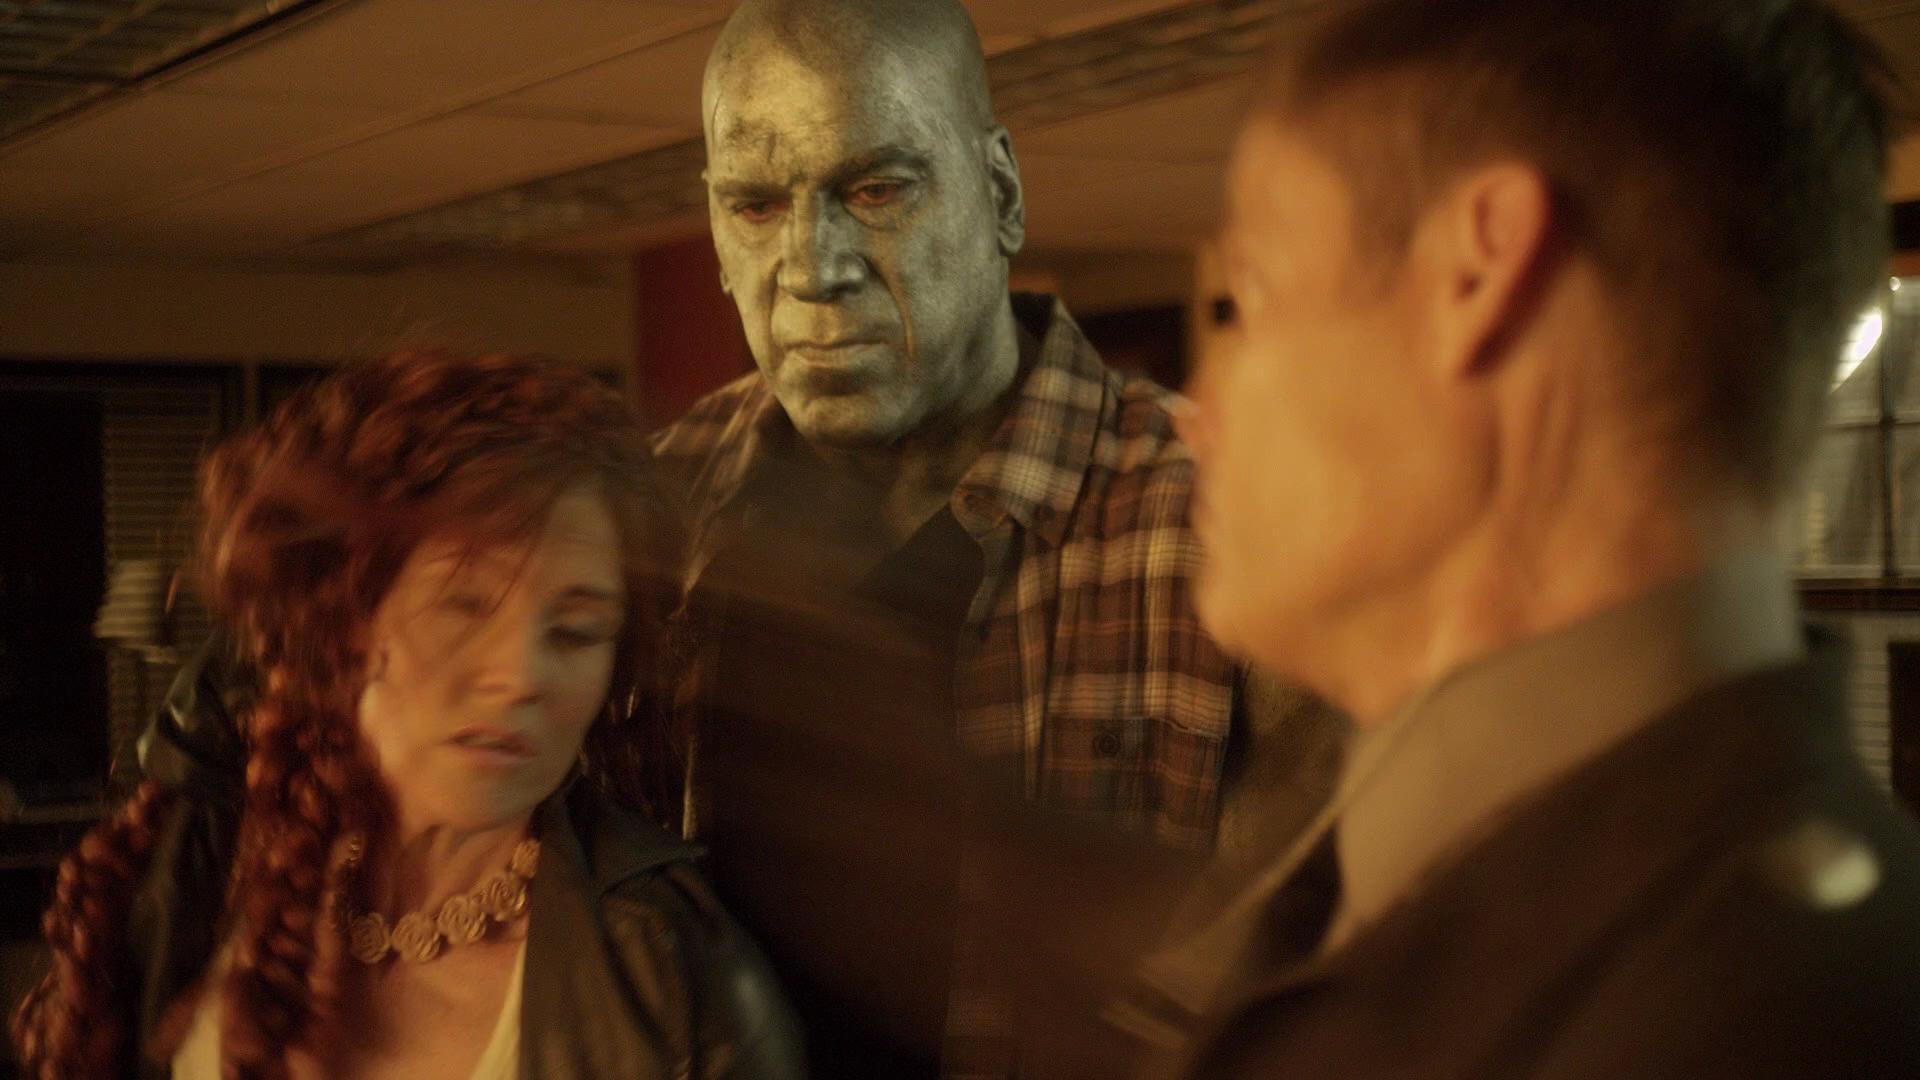 Casper Van Dien, Lou Ferrigno, and Rileah Vanderbilt in Avengers Grimm (2015)